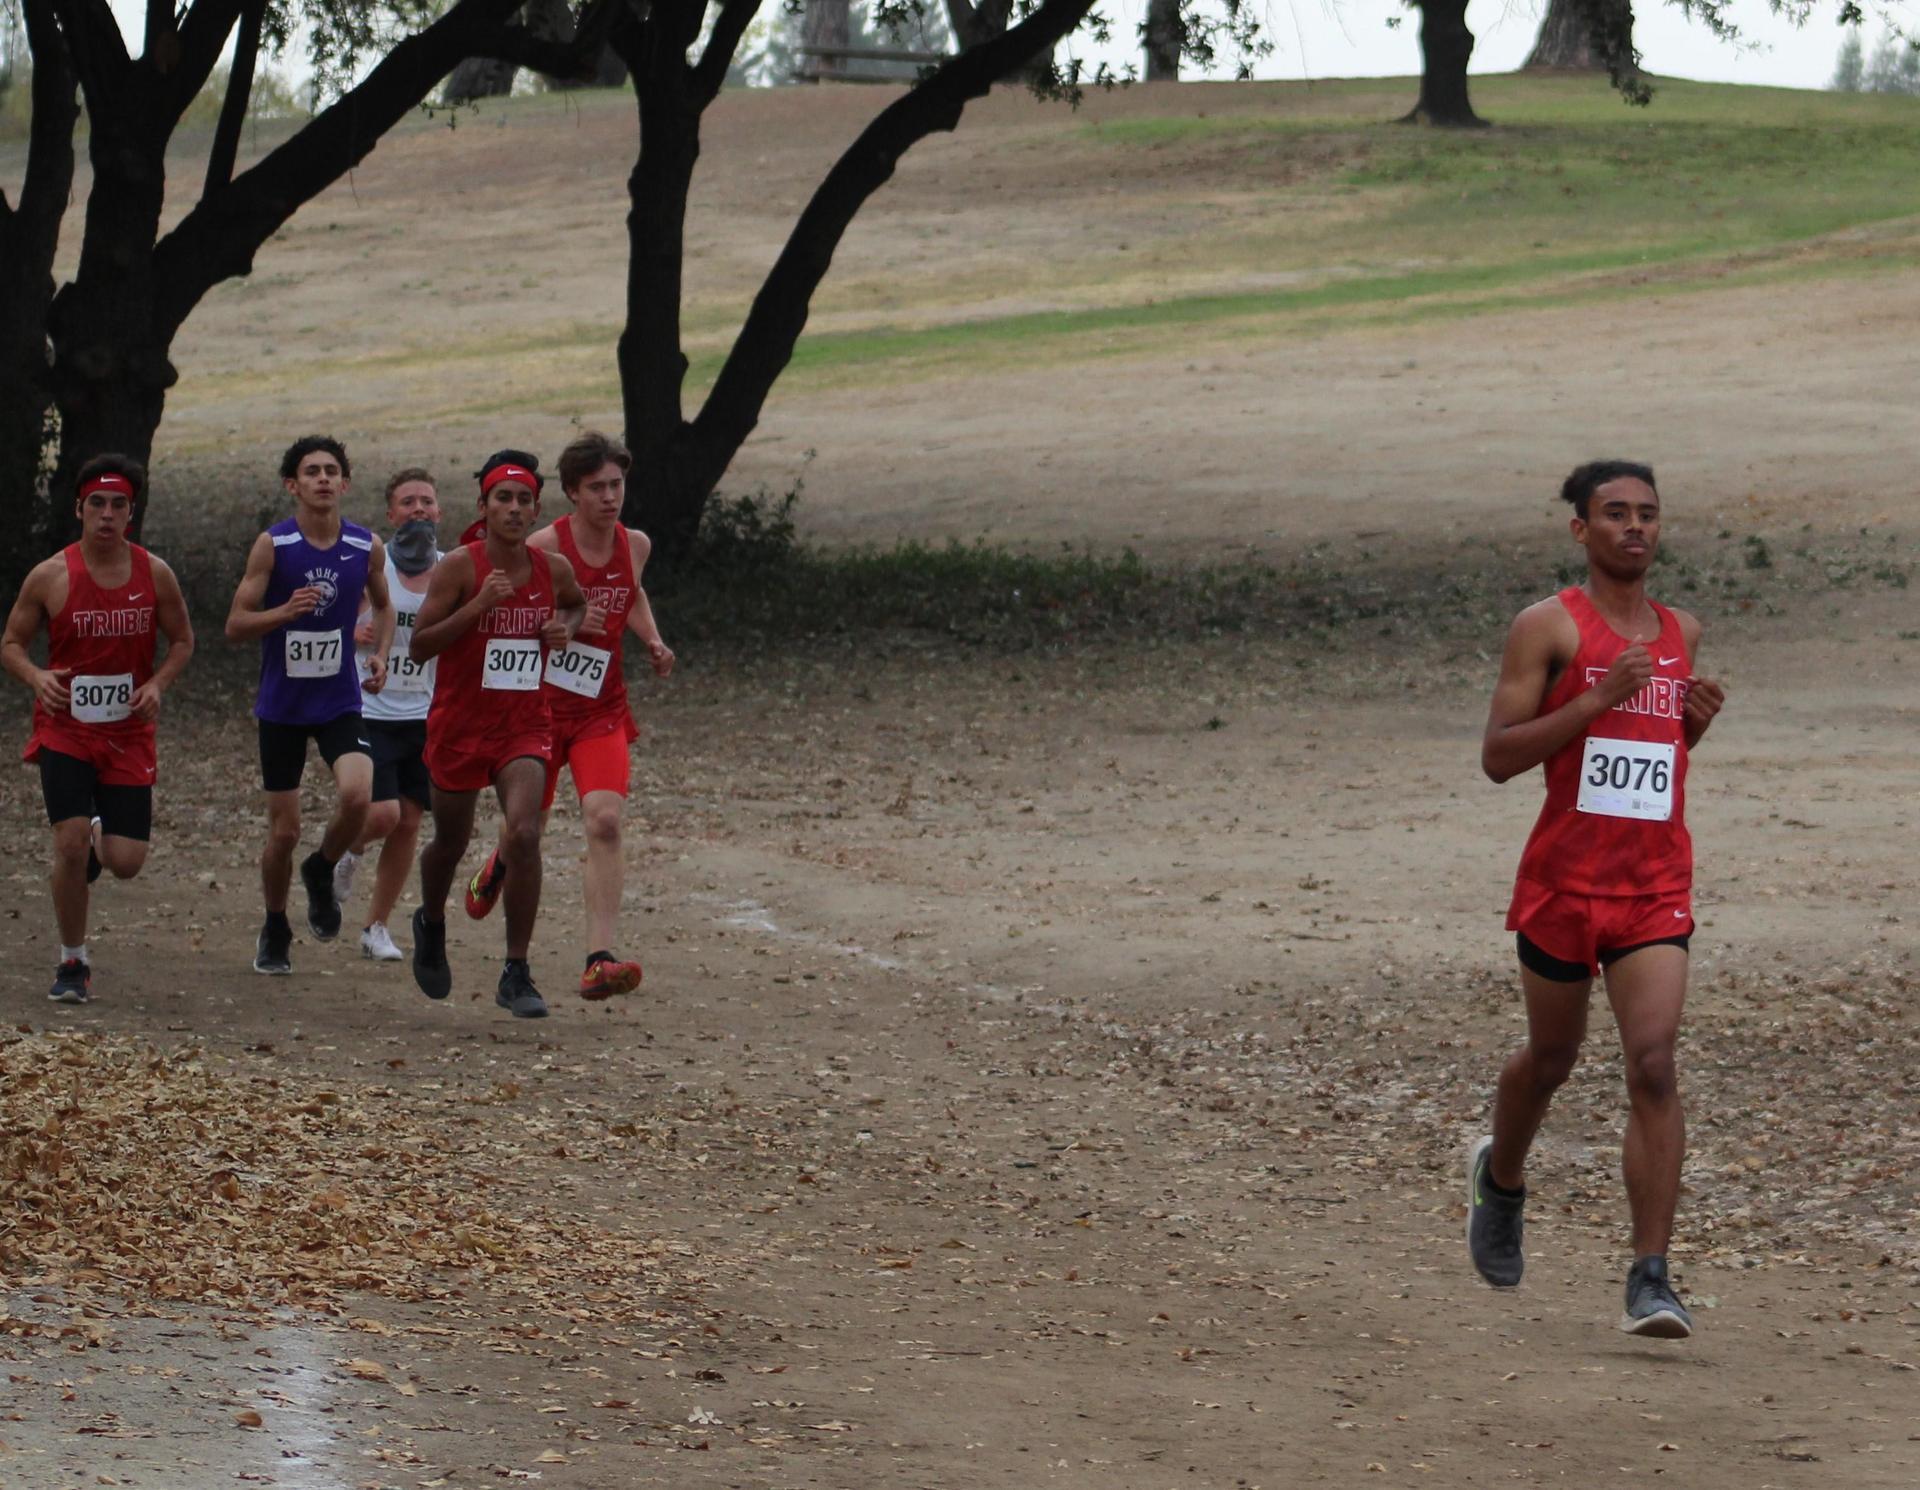 Lawerence Luna, Nicholas Martinez, Raymond Mendoza and Nick Upton racing at woodward park